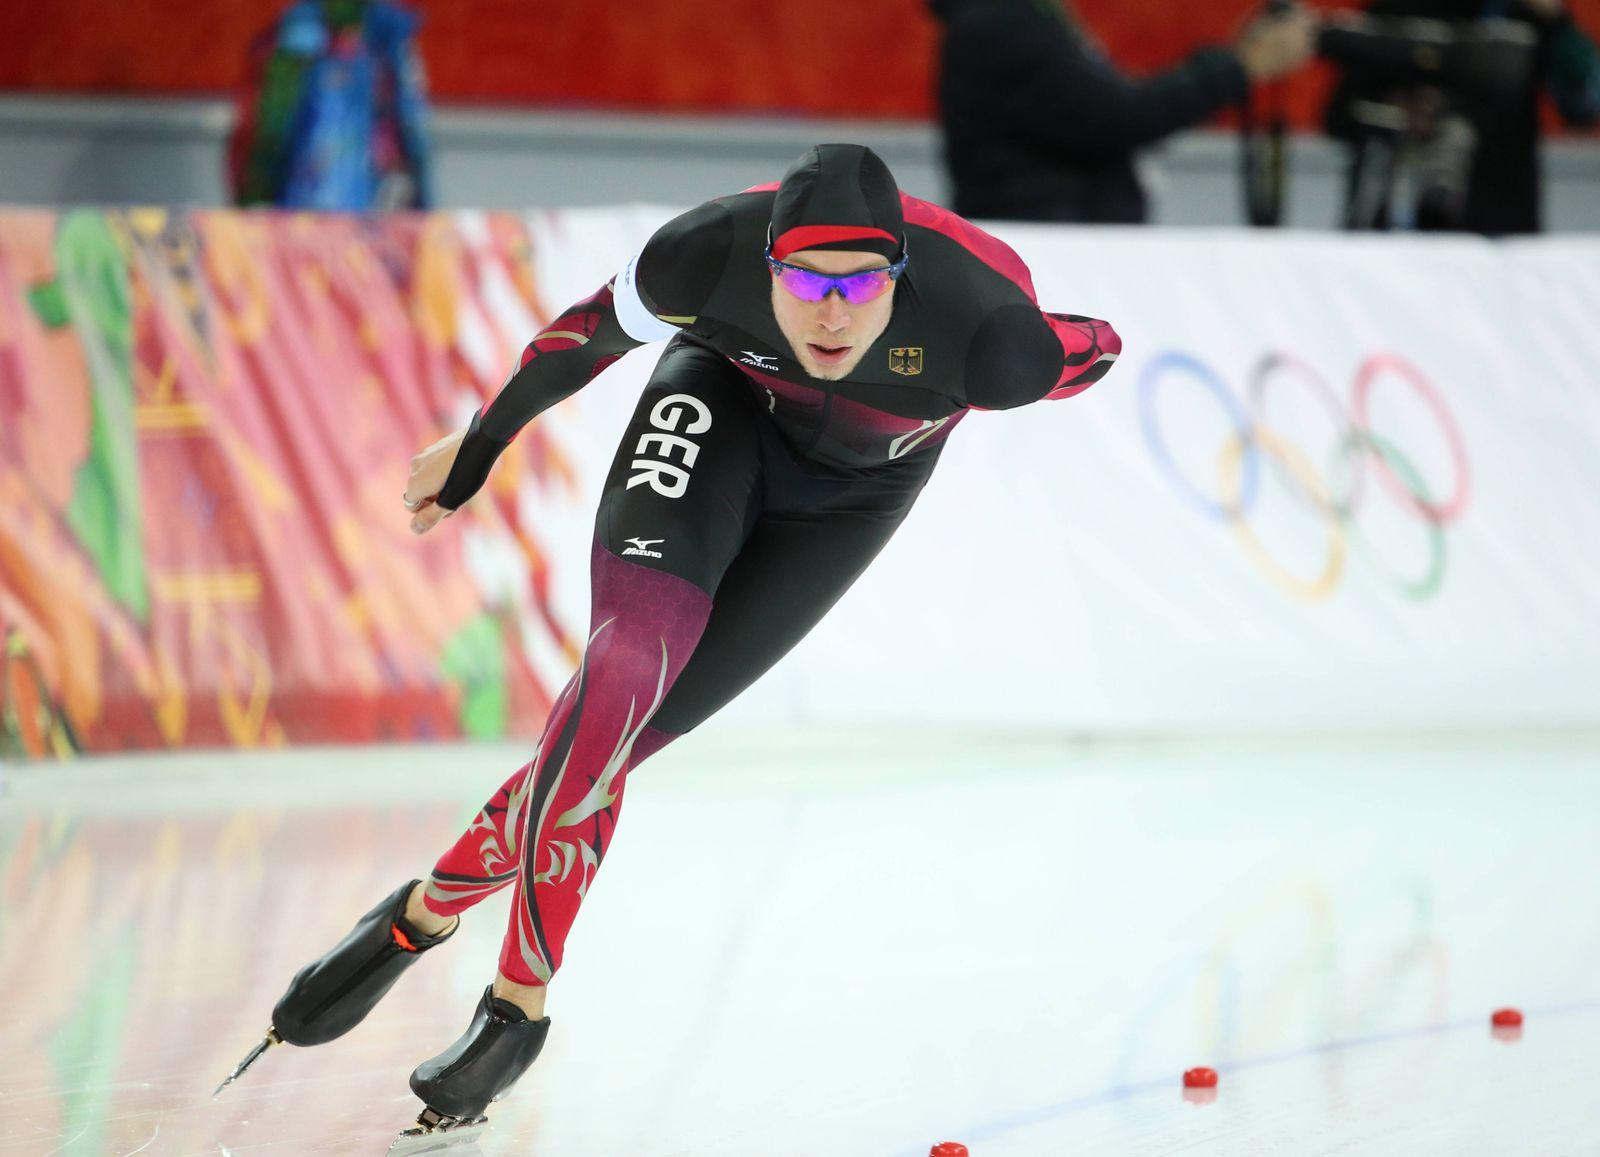 Sotschi Olympia XXII Olympische Winterspiele 2014 Olympic winter games sochi 18 02 2014 Adler